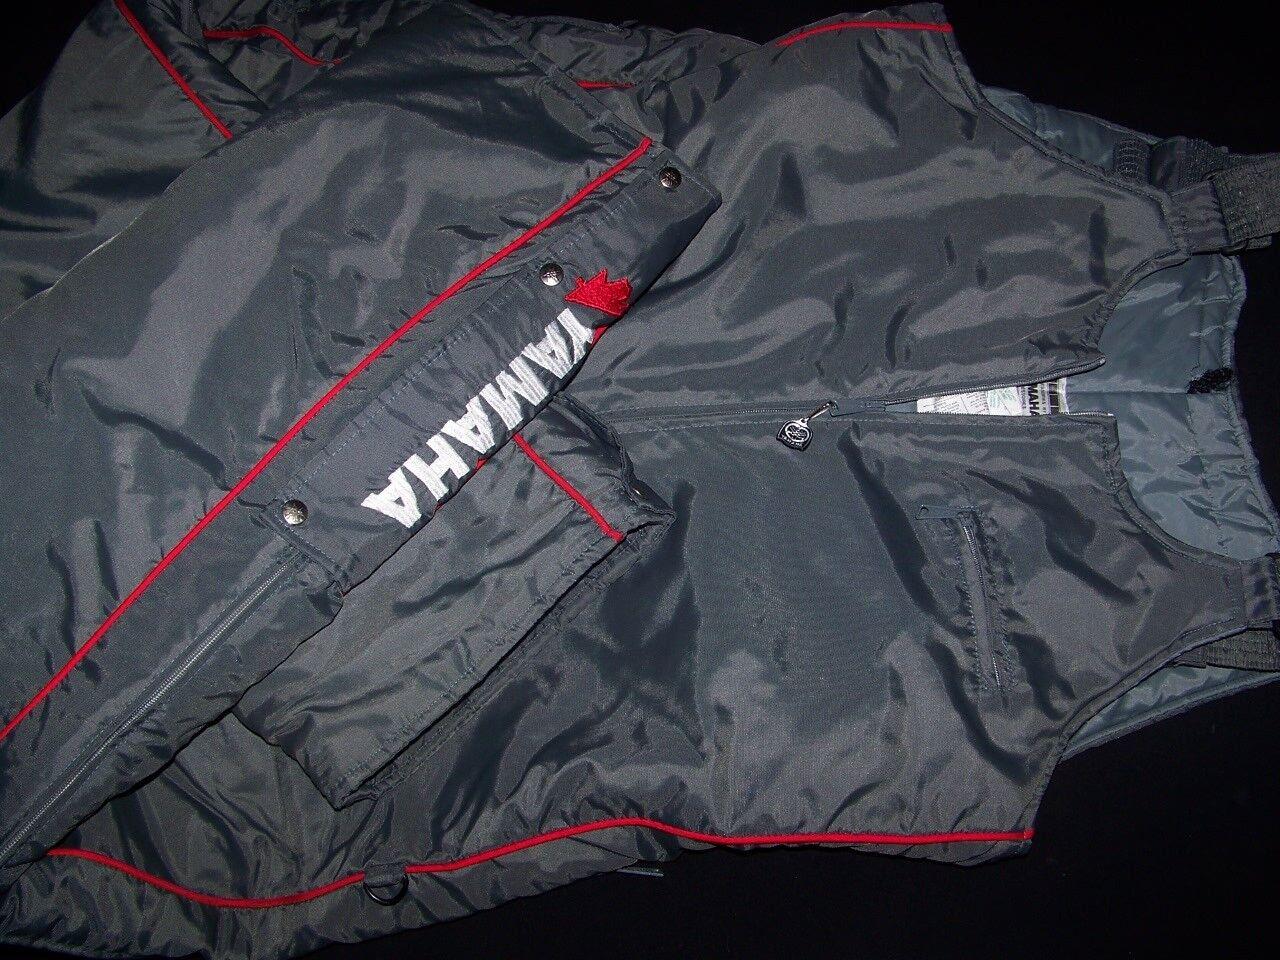 Yamaha 1988 Vintage Snowmobile  Pants Bib 1980s Skidoo Winter Parka Grey Red XXL  store